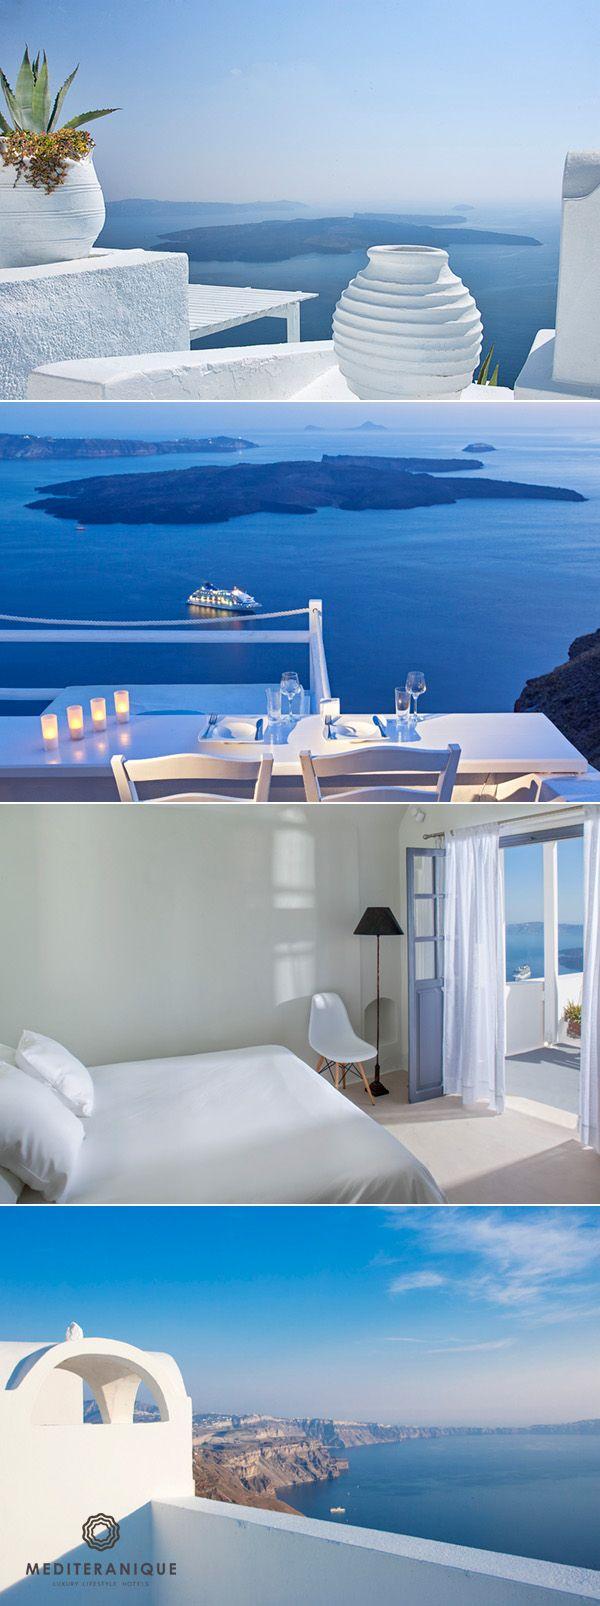 On the Rocks Hotel, Santorini, Greece http://www.mediteranique.com/hotels-greece/santorini/on-the-rocks-santorini/